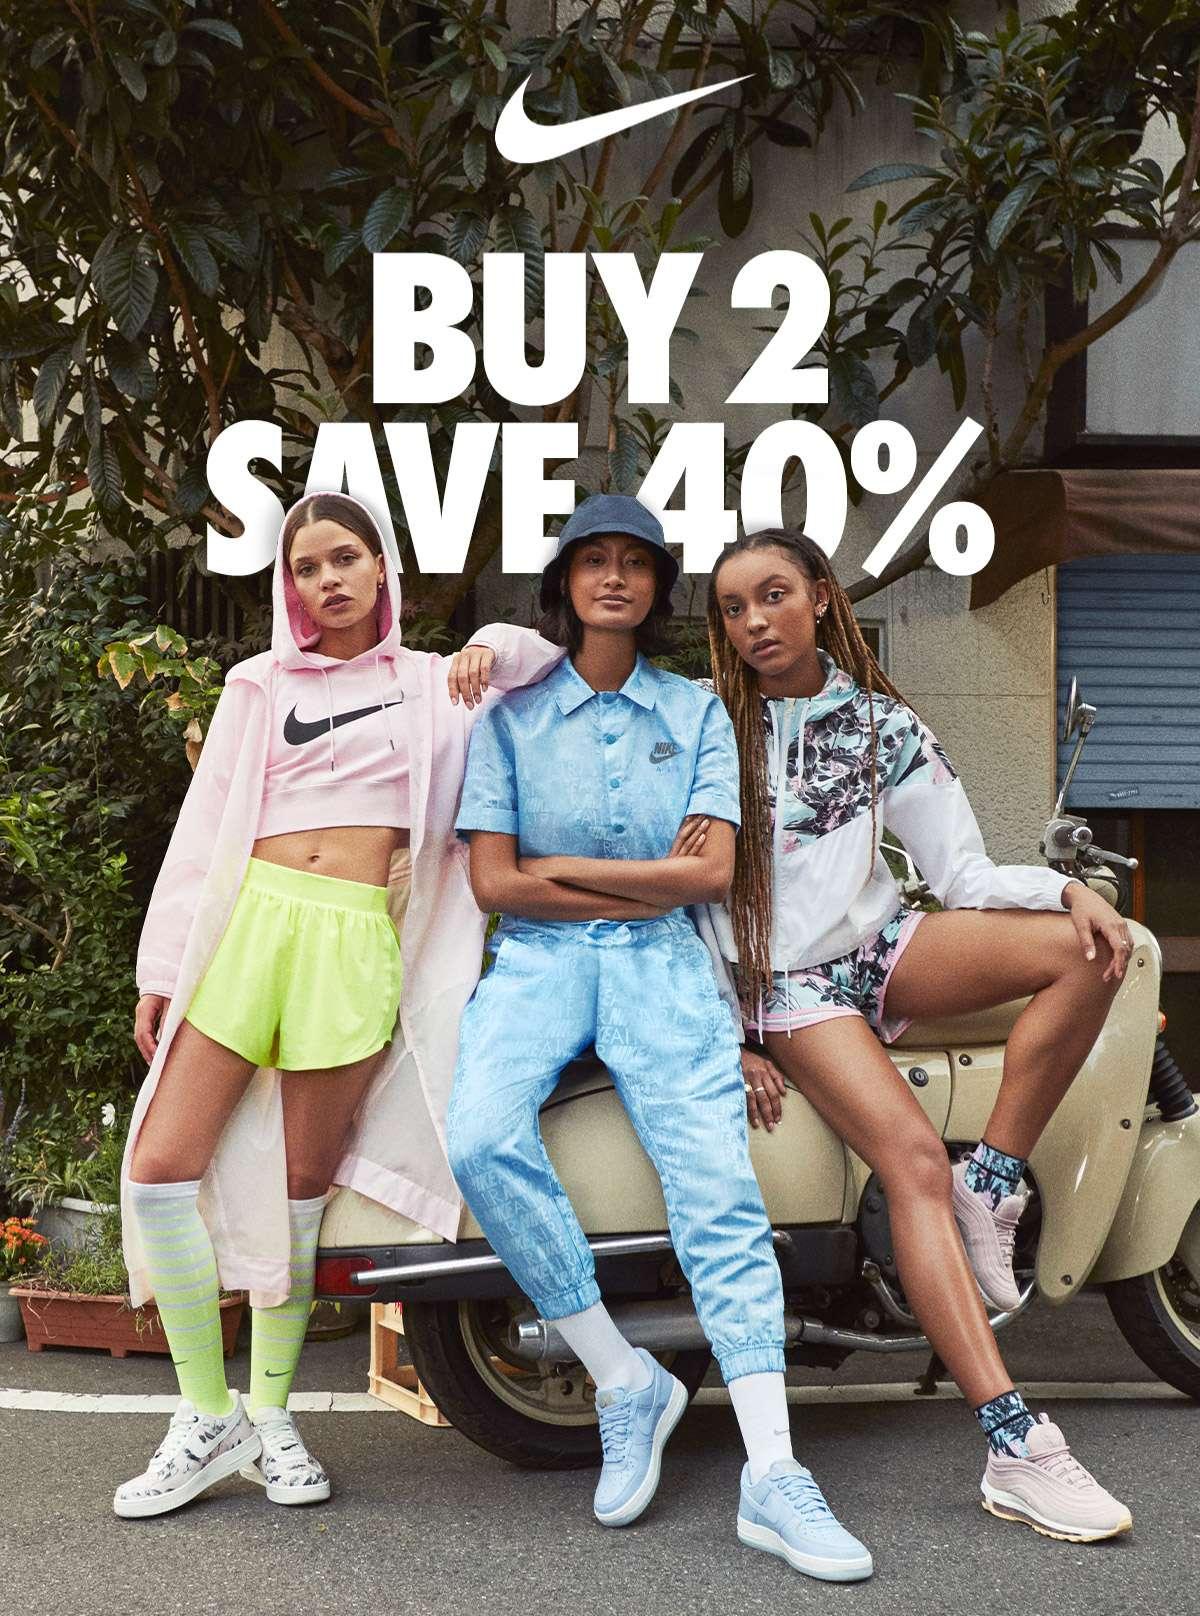 NIKE | BUY 2 SAVE 40%